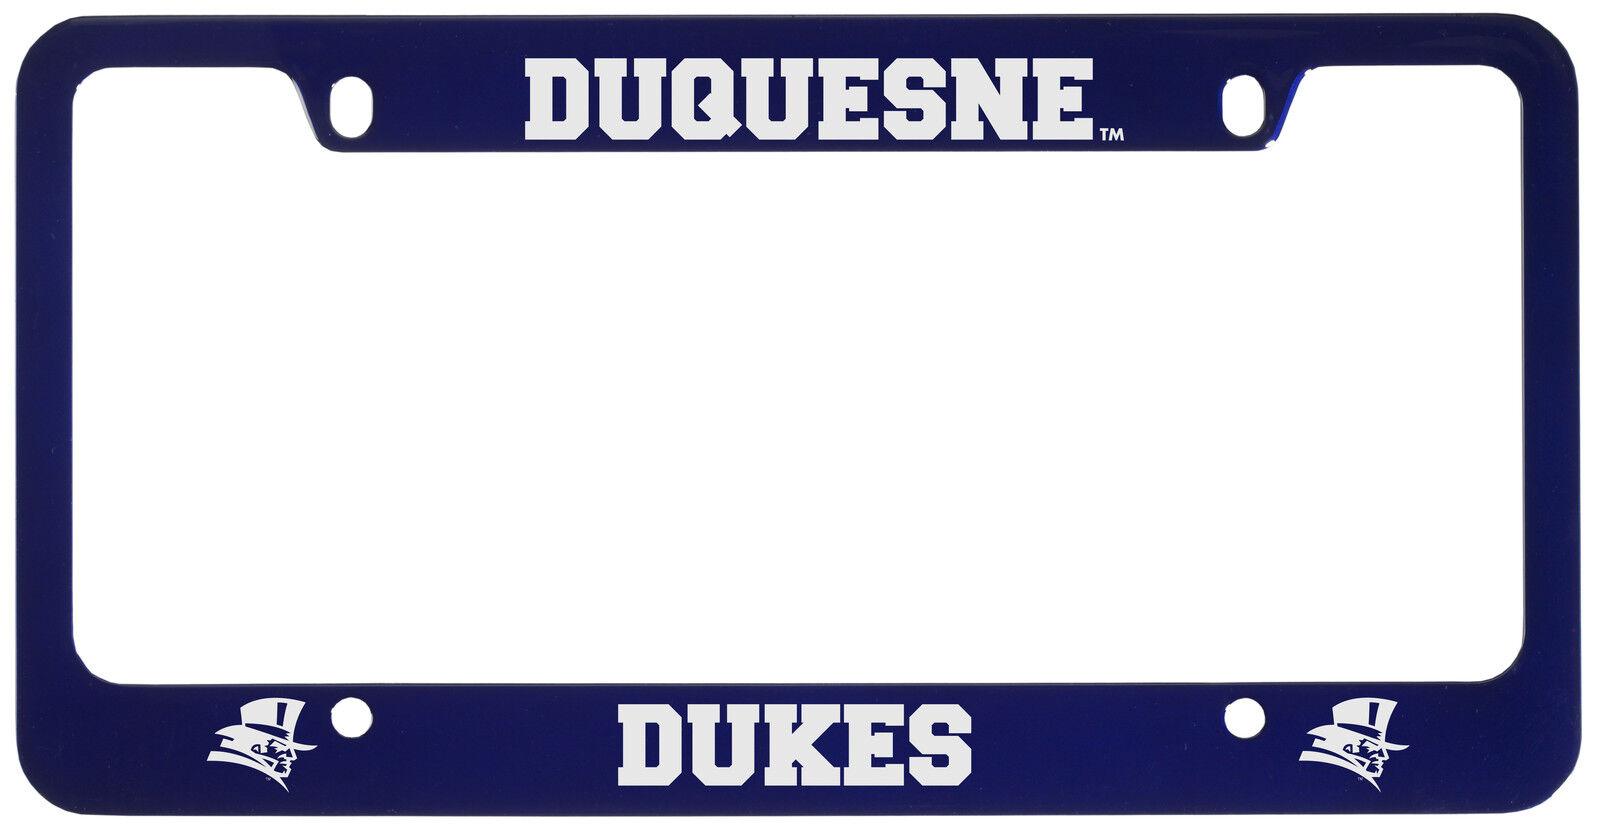 Duquesne University -metal License Plate Frame-blue | eBay